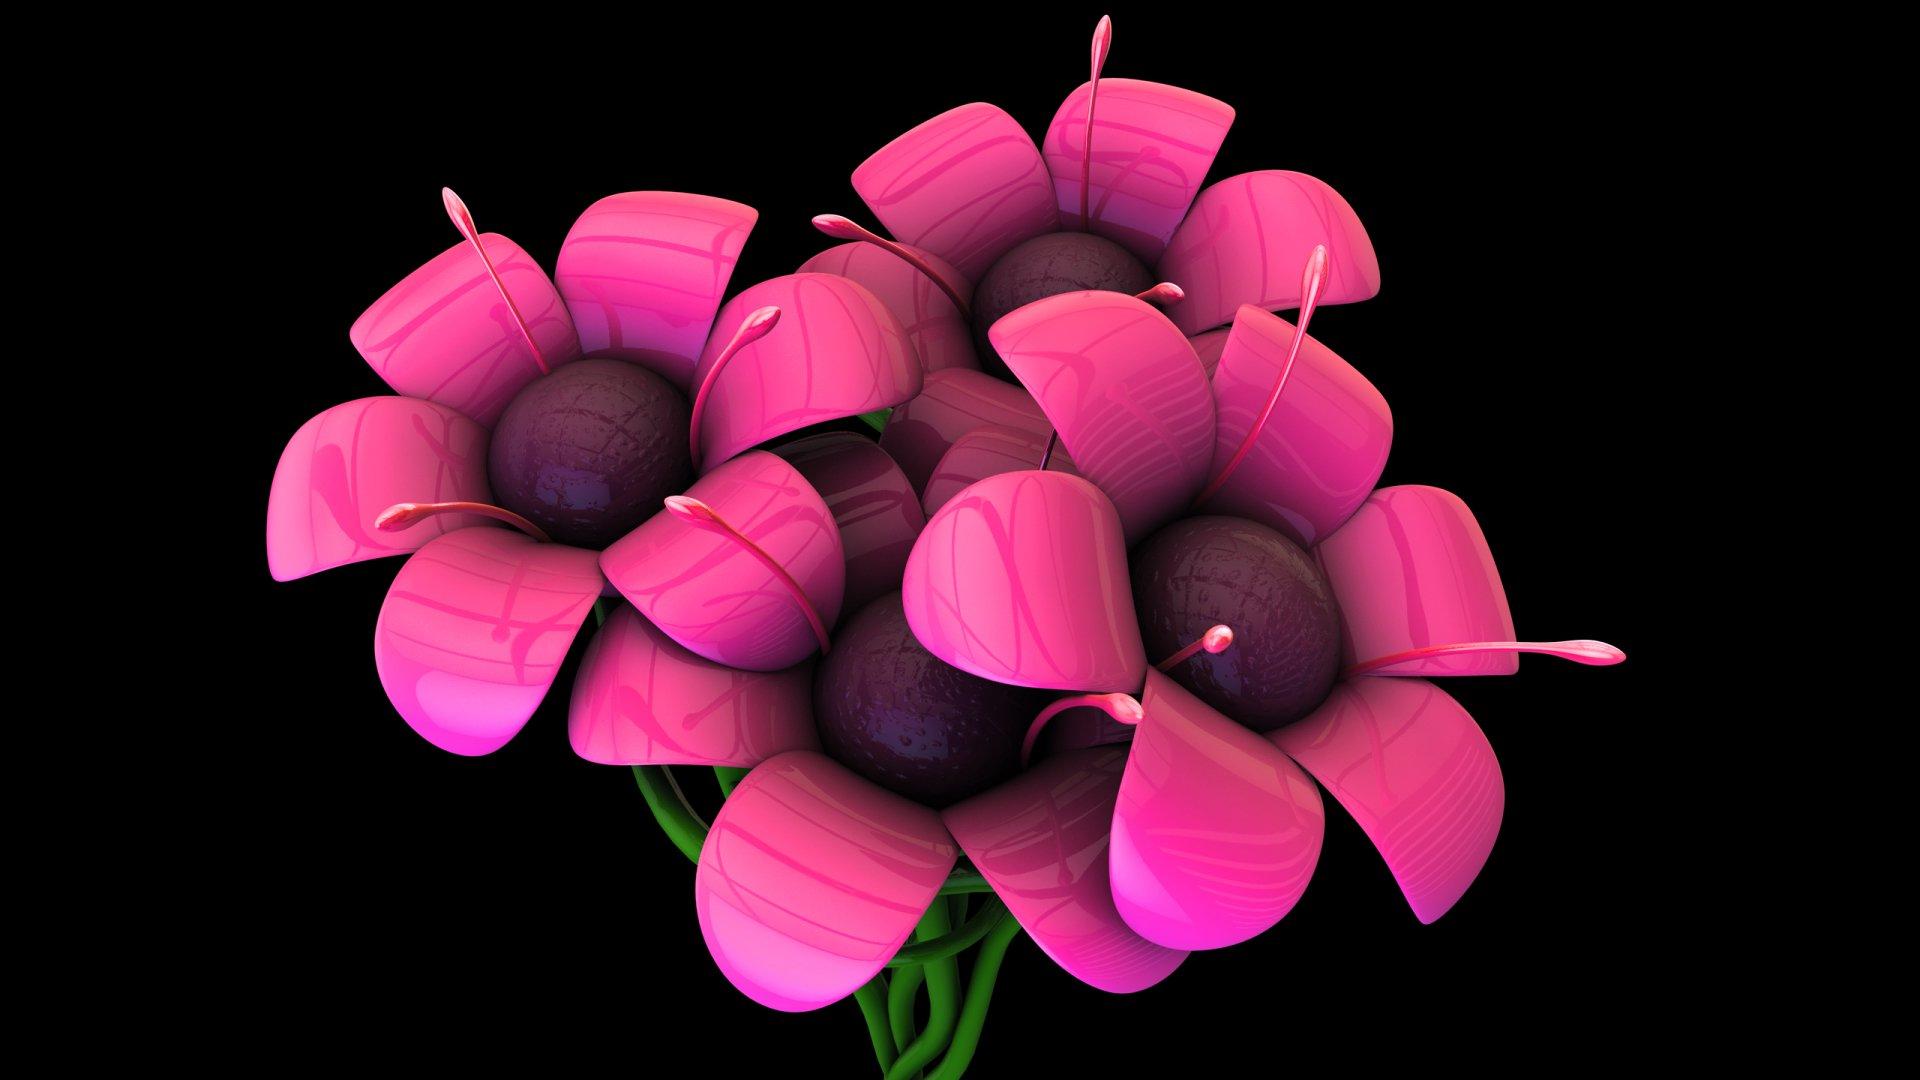 CGI - Cool  Plant Flower Wallpaper